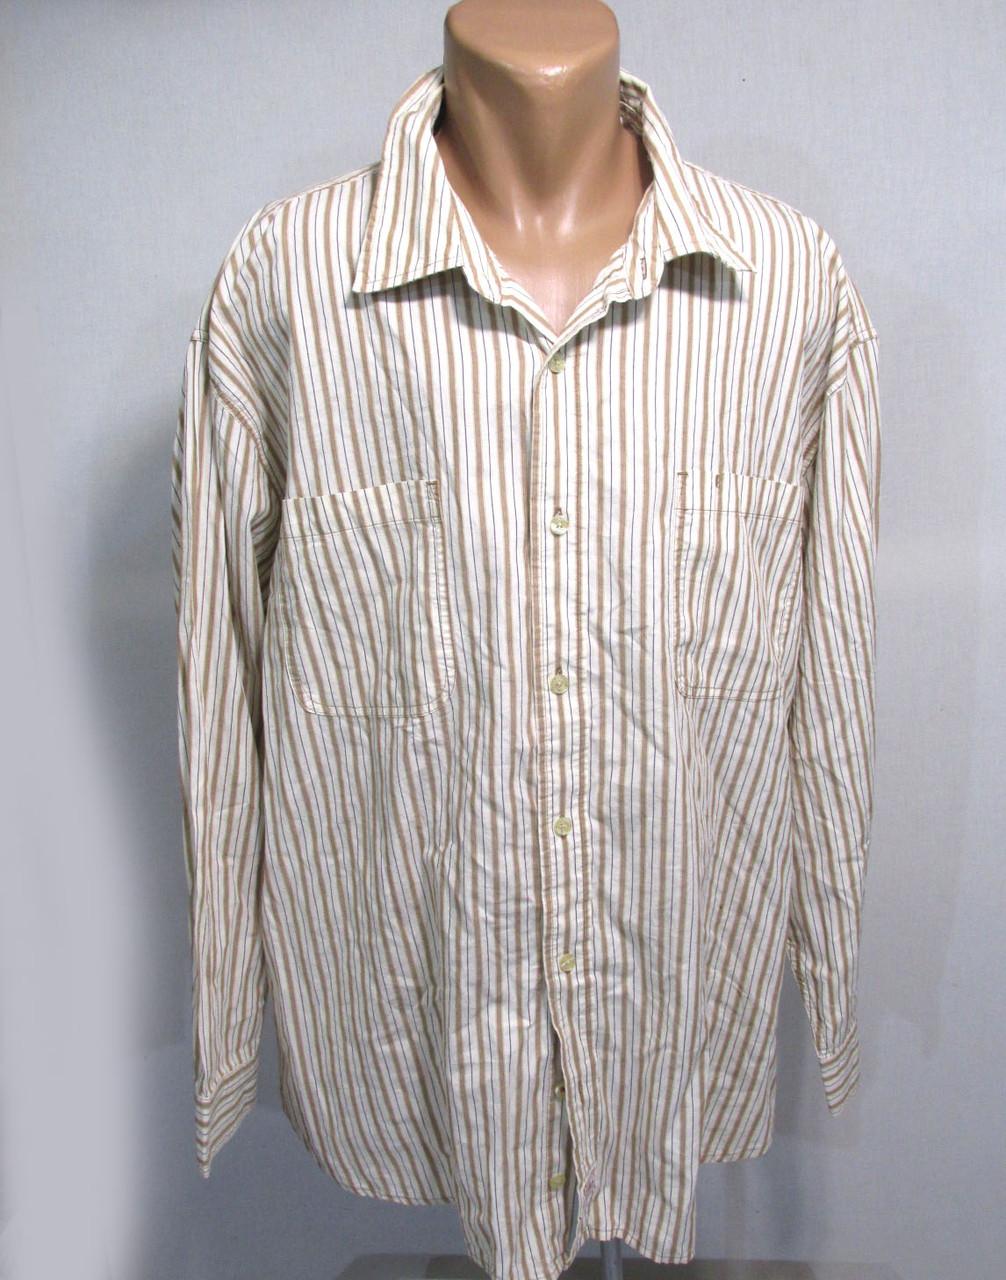 Рубашка LEVI Strauss, 3XL, Cotton, Оригинал!